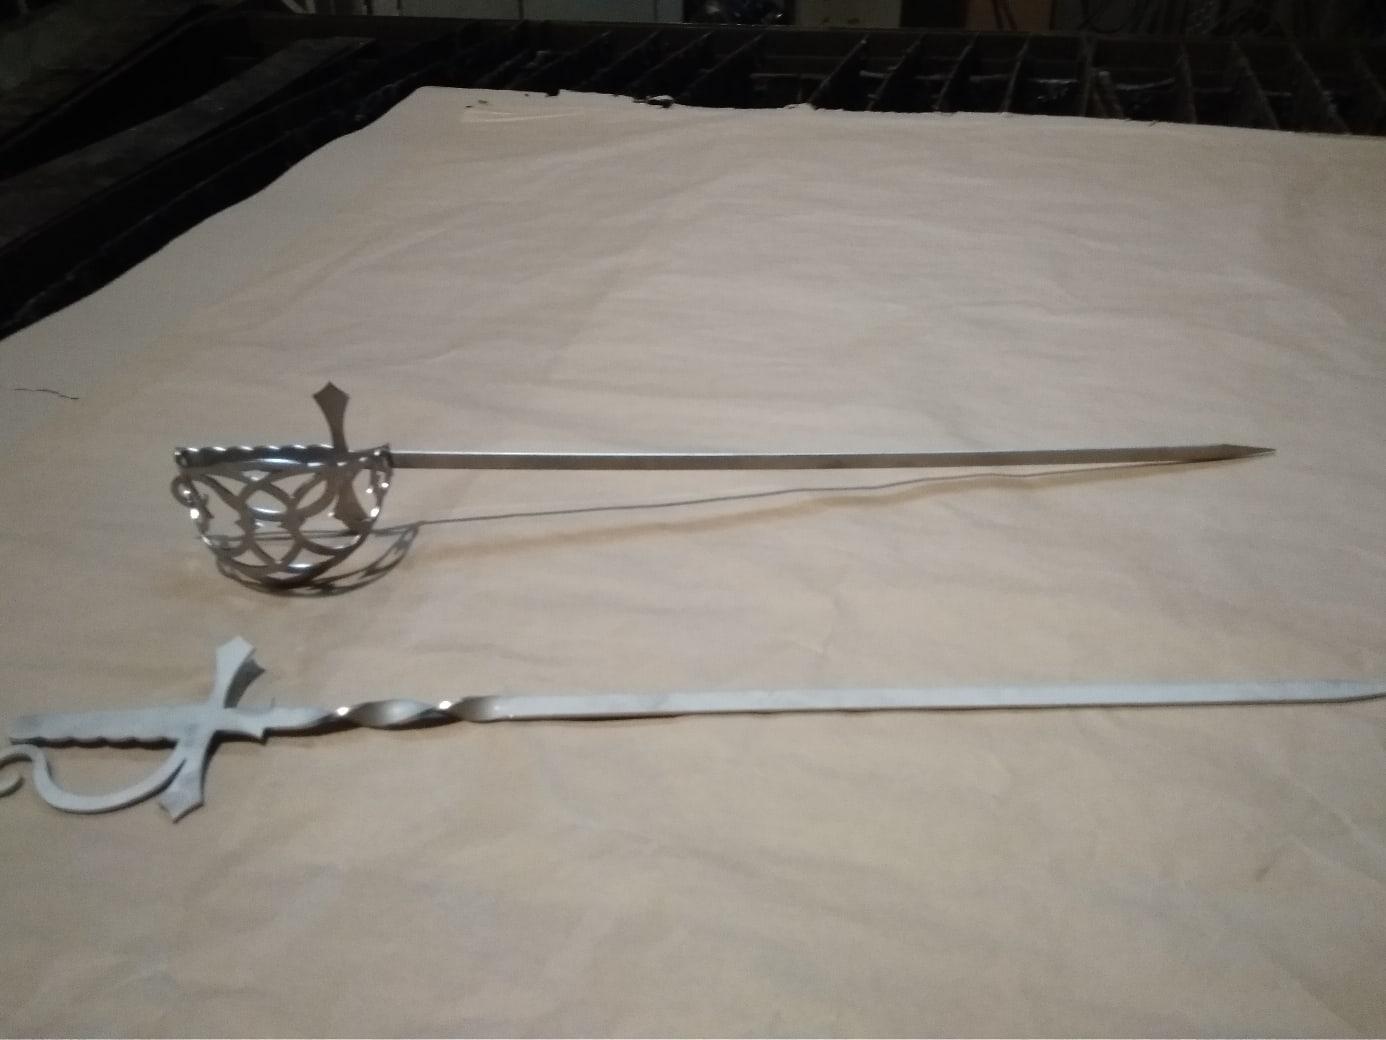 Laser Cut Sabre Skewer Sword Free DXF File